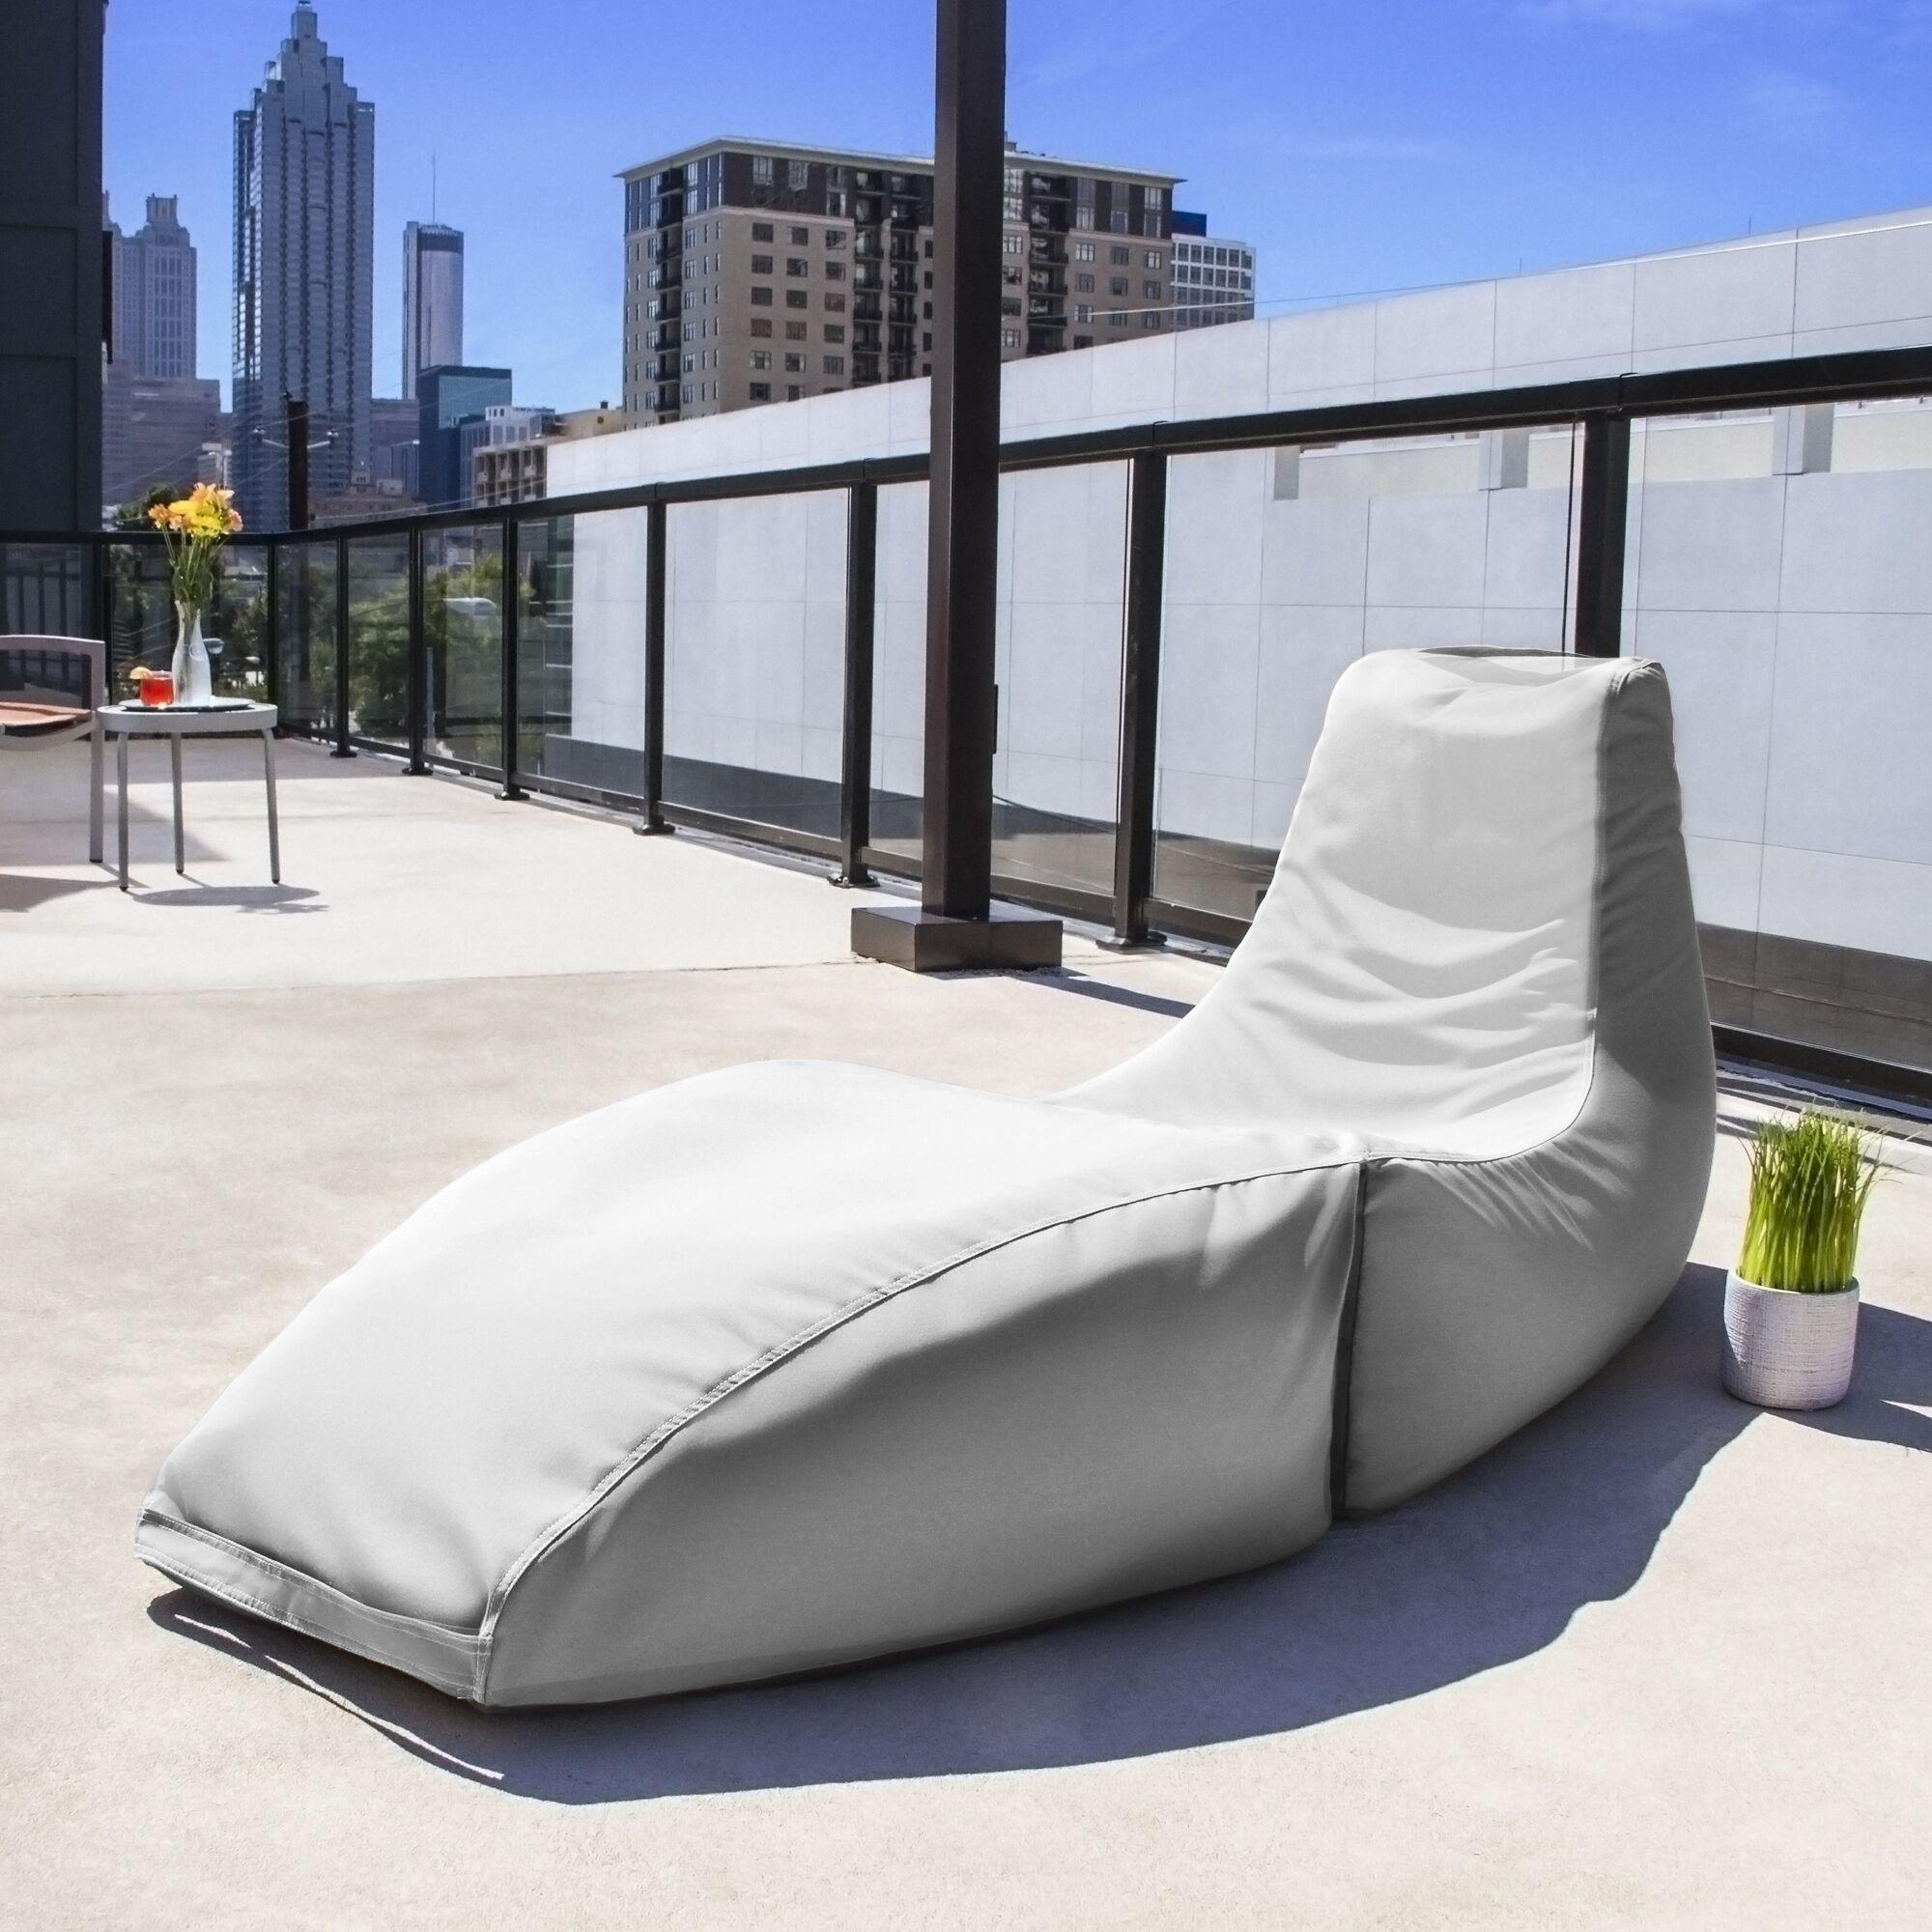 Prado Outdoor Bean Bag Chaise Lounge Chair Color: White